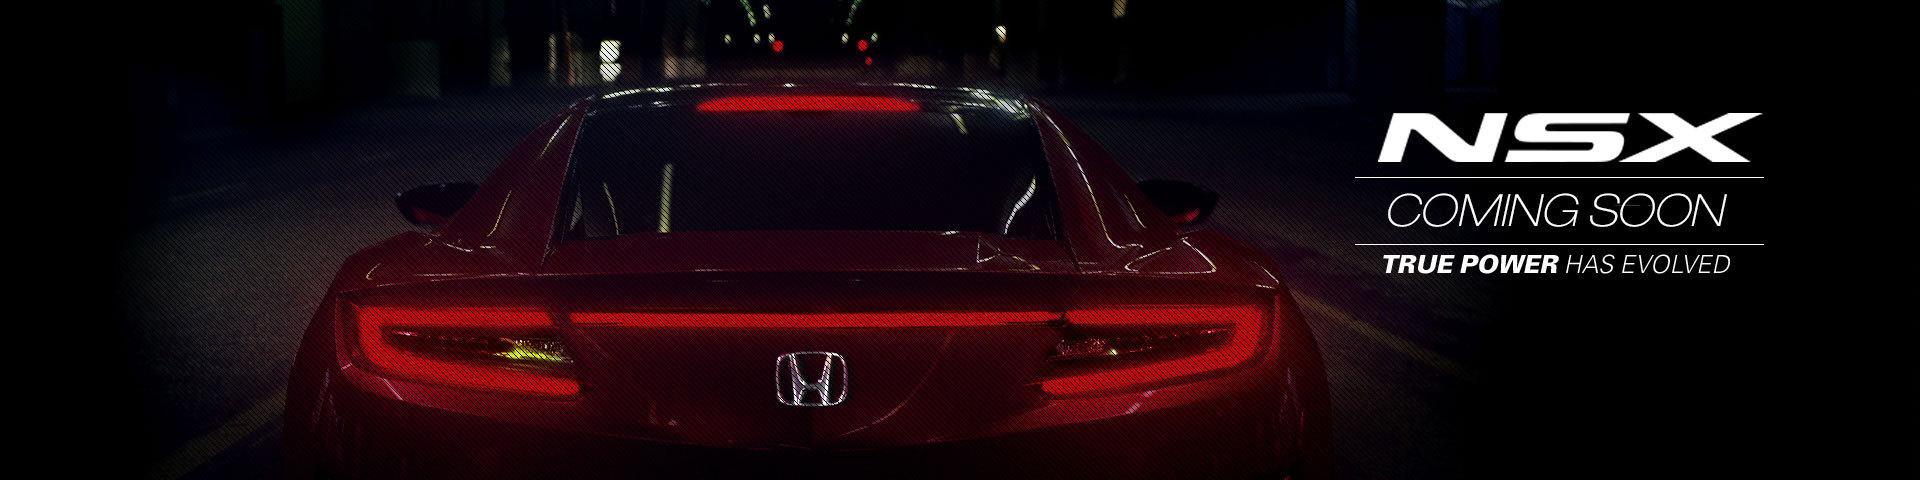 Honda NSX | Coming Soon